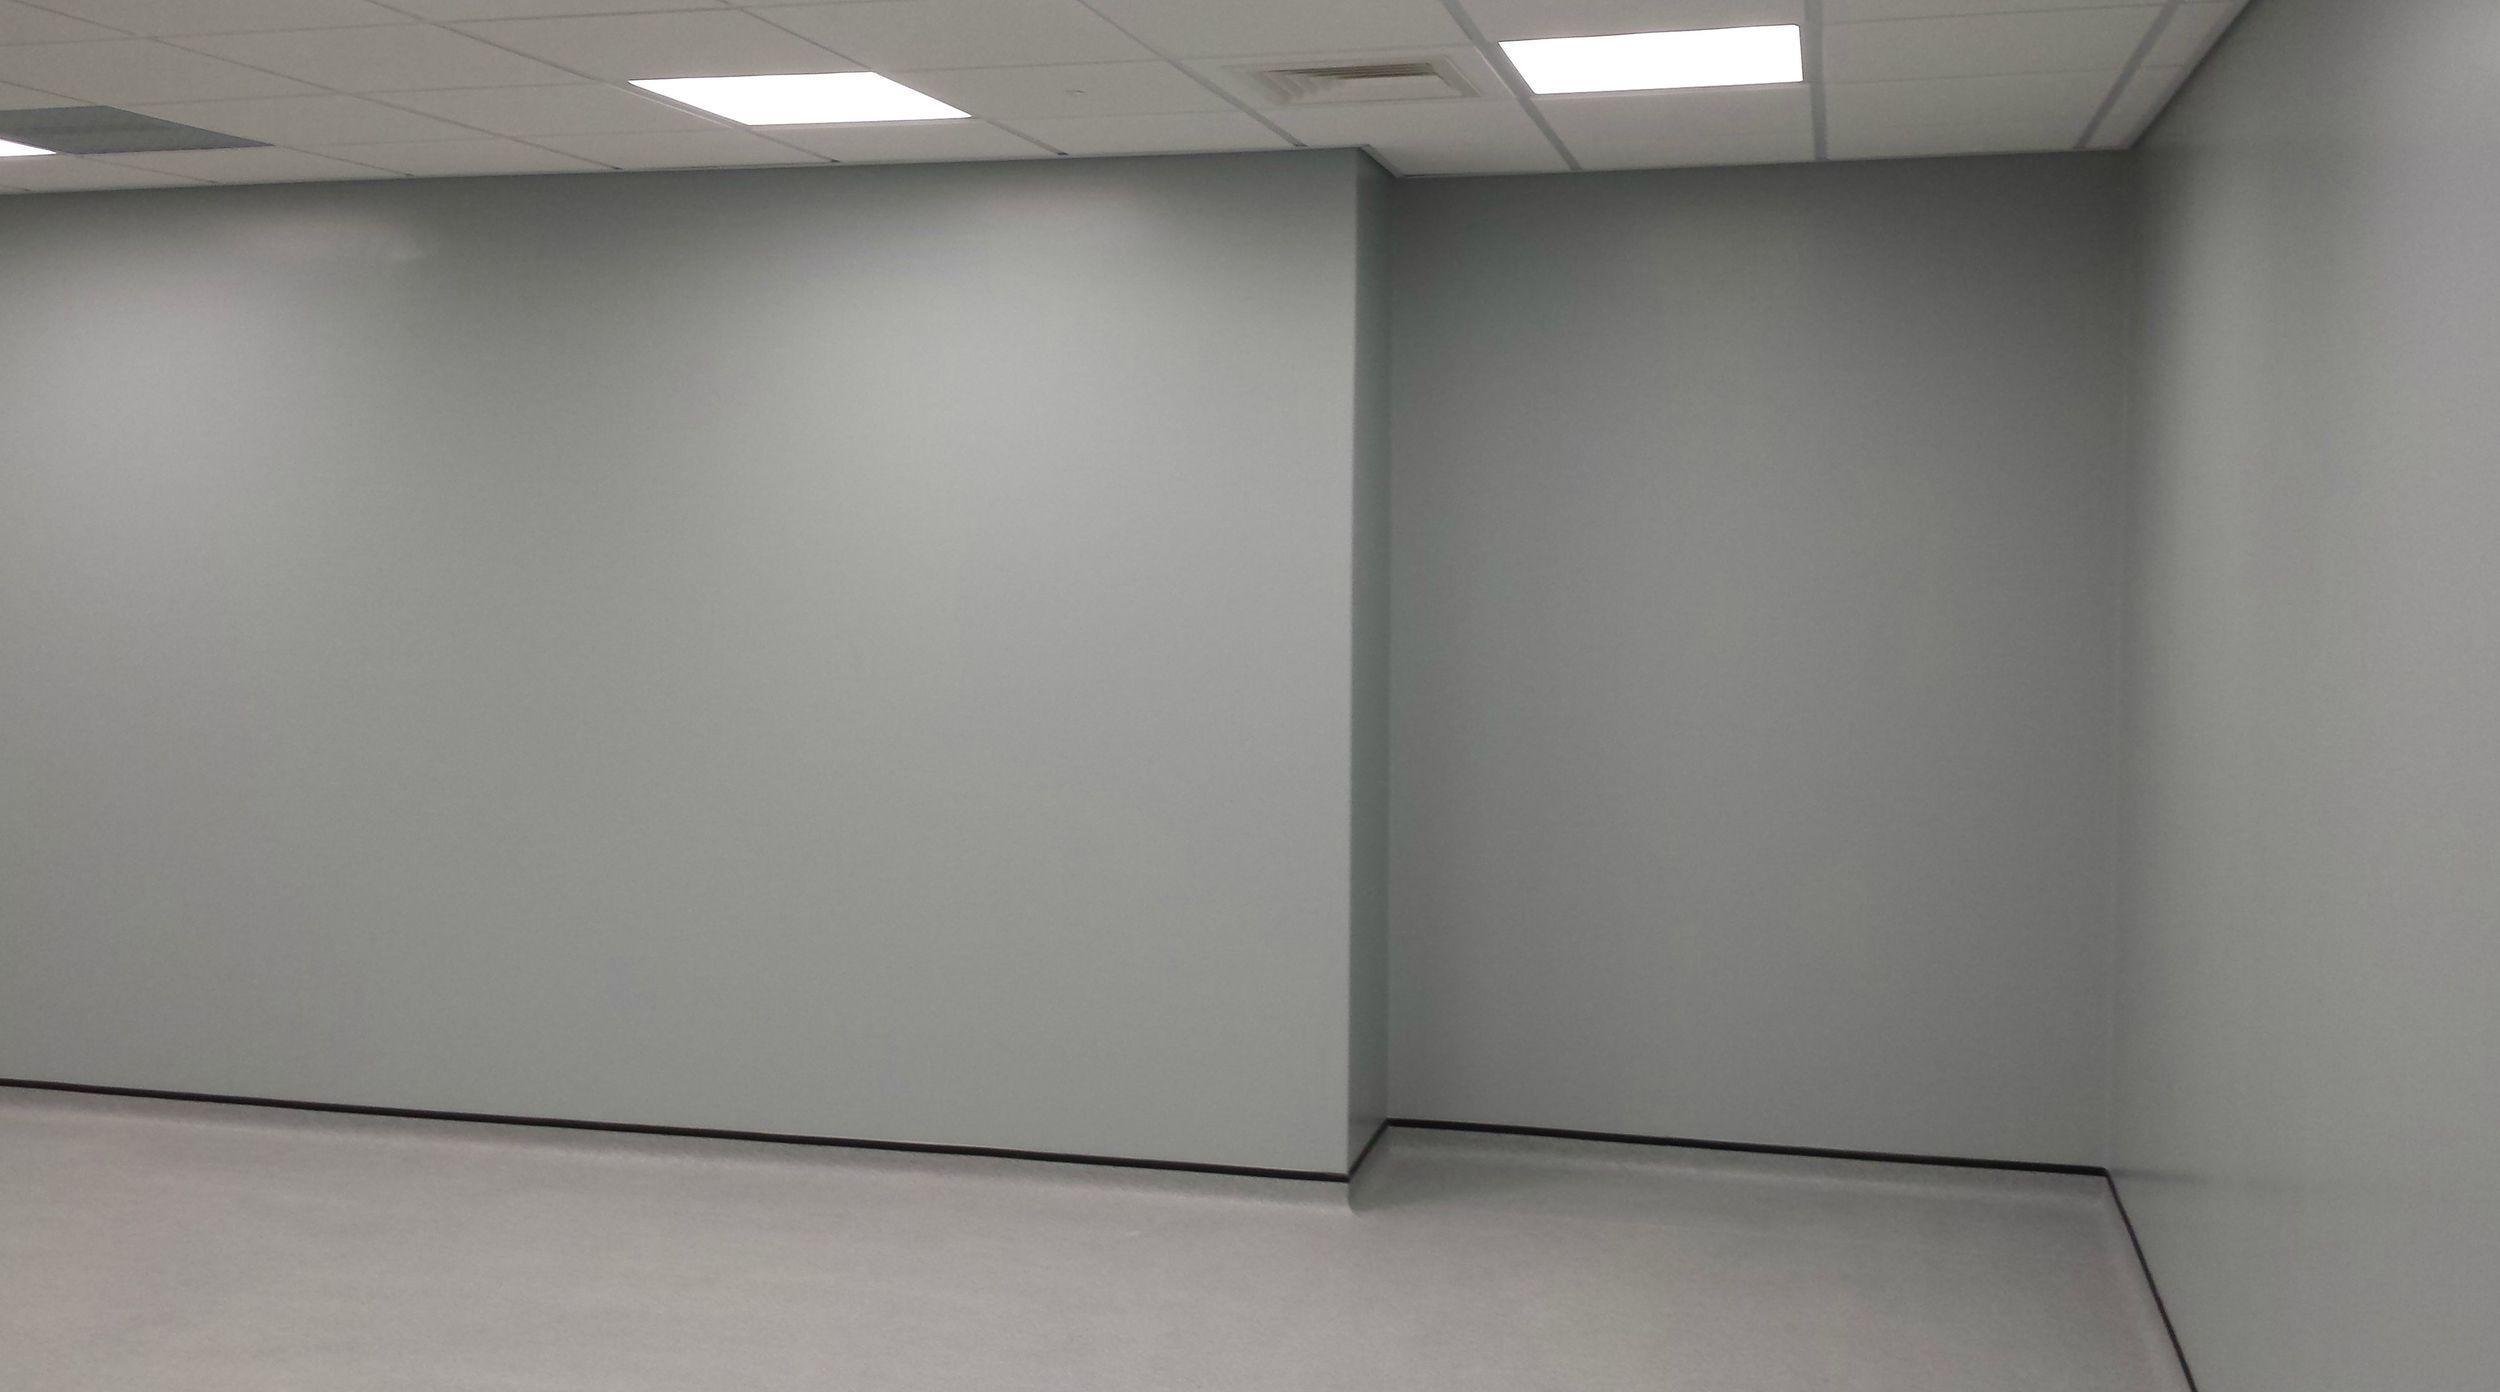 BeFunky_L3 - Locker Room (1).jpg.jpg